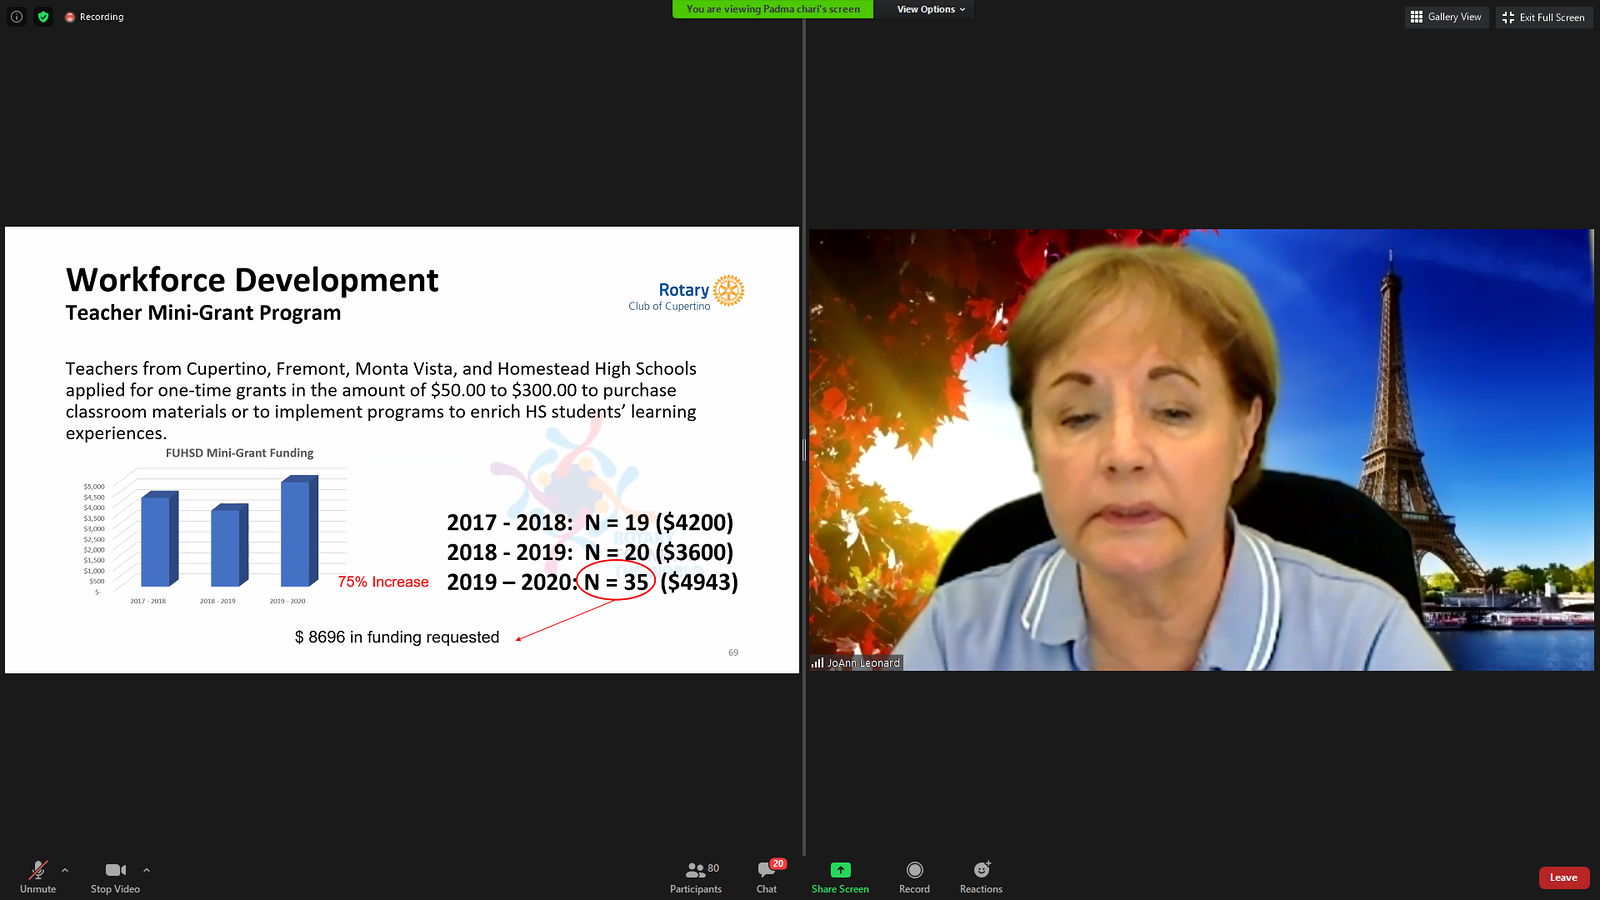 Screenshot 2020-06-03 13.11.13.png